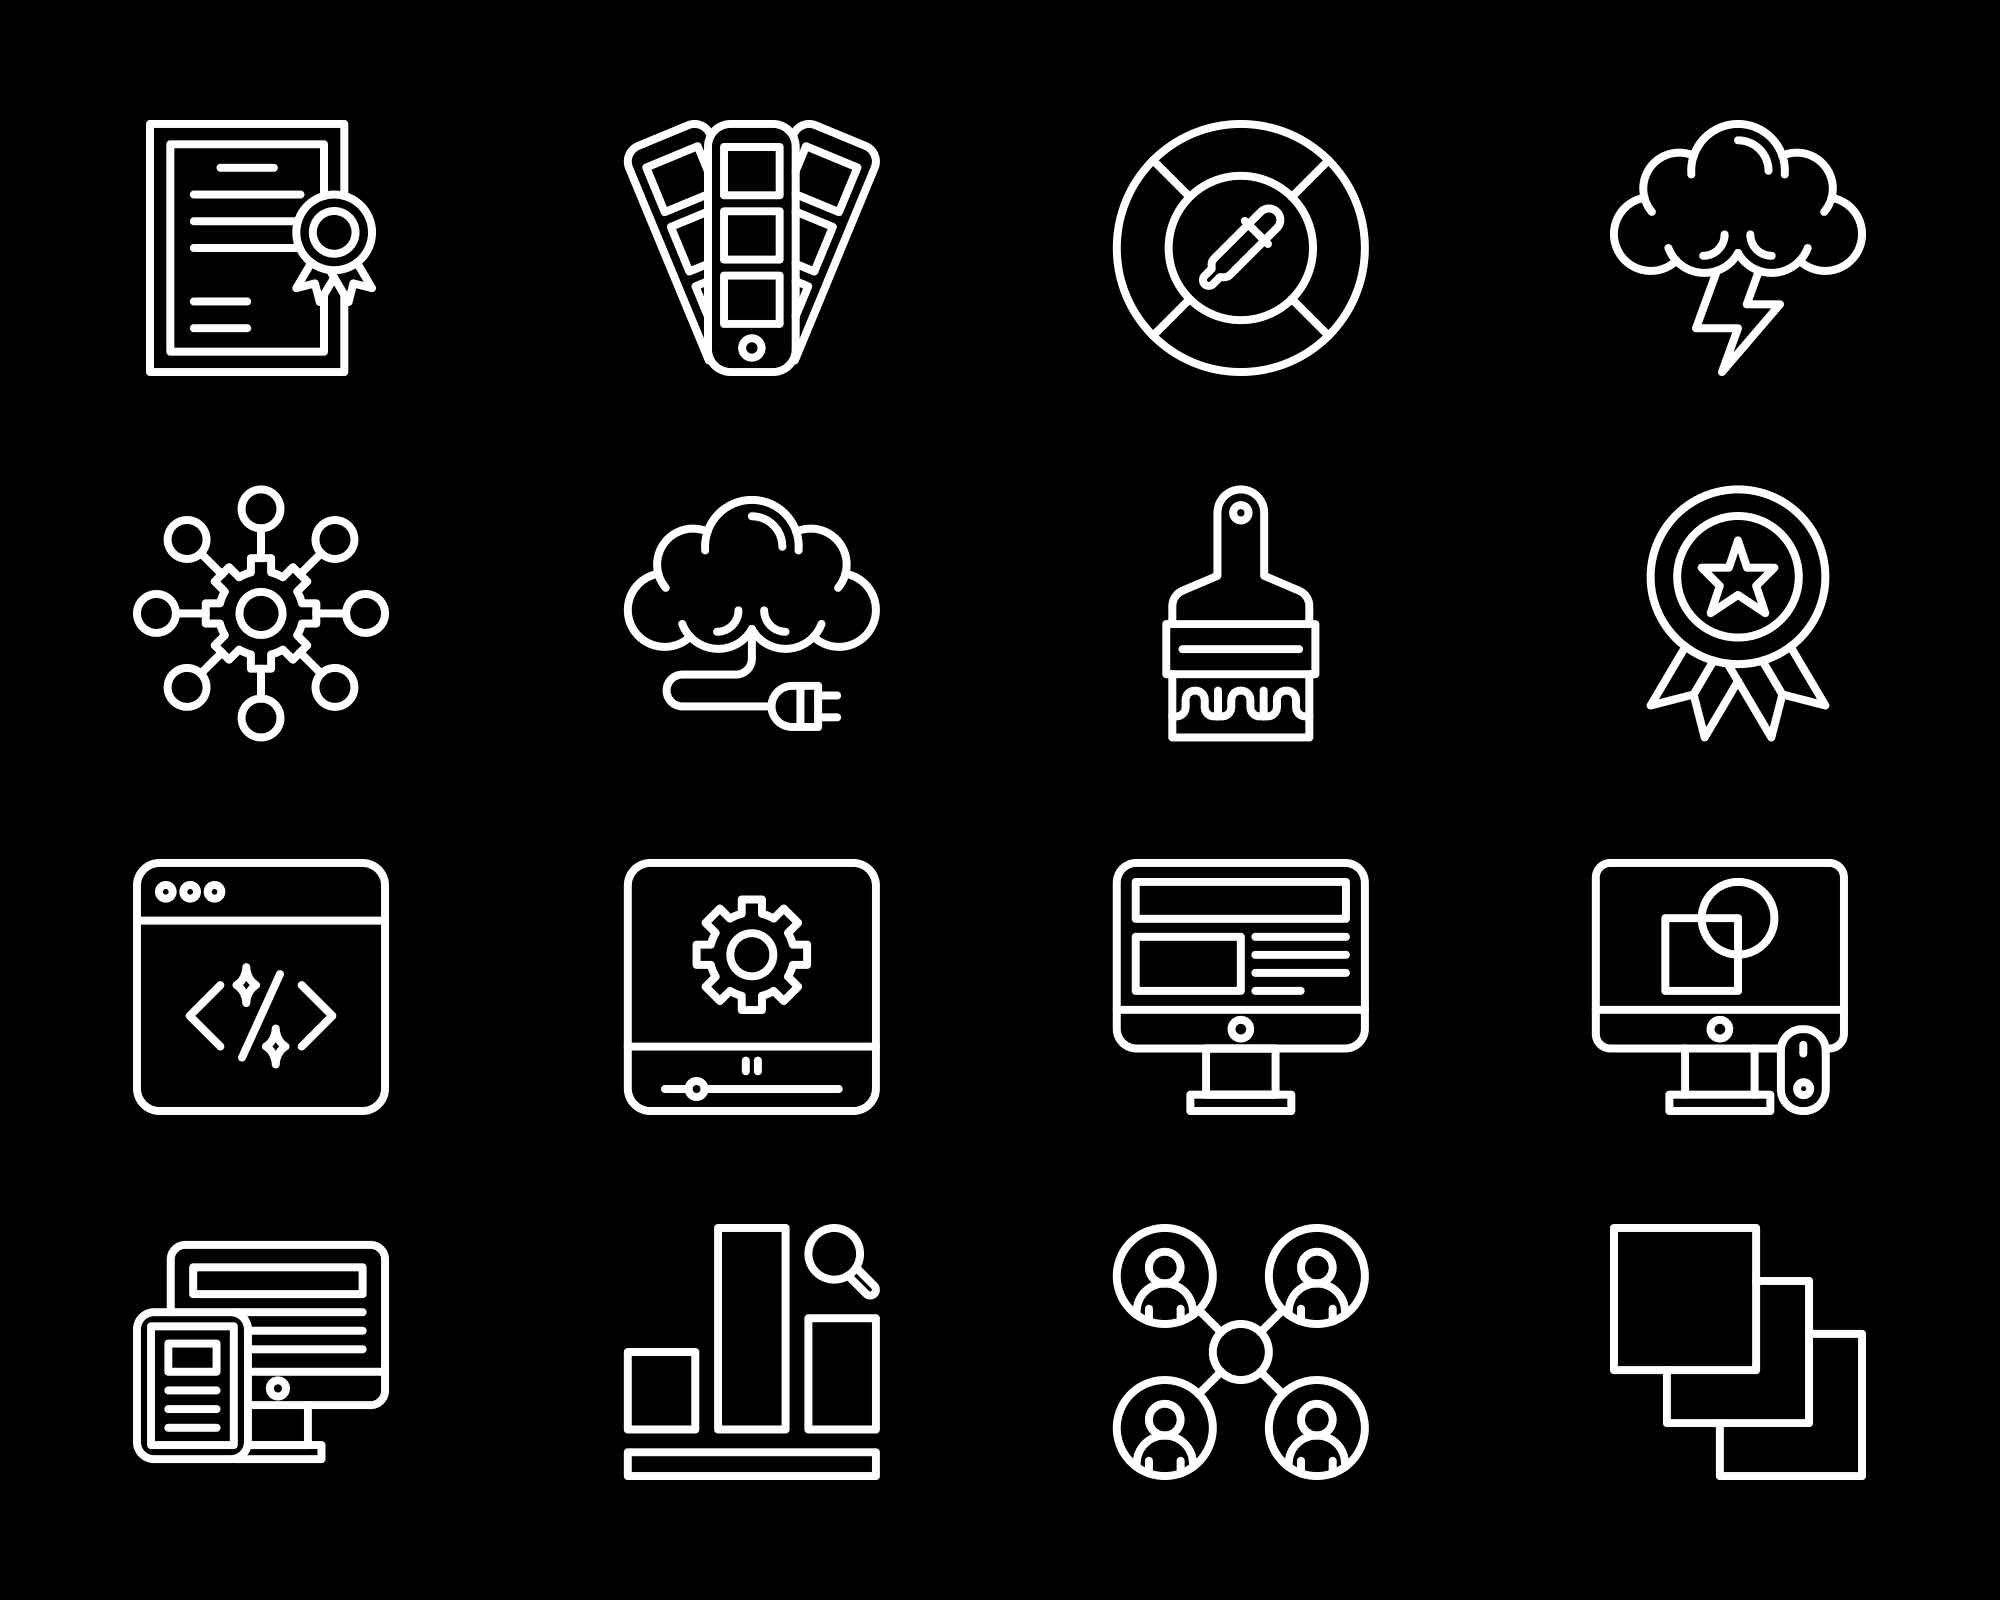 Design Icons 2